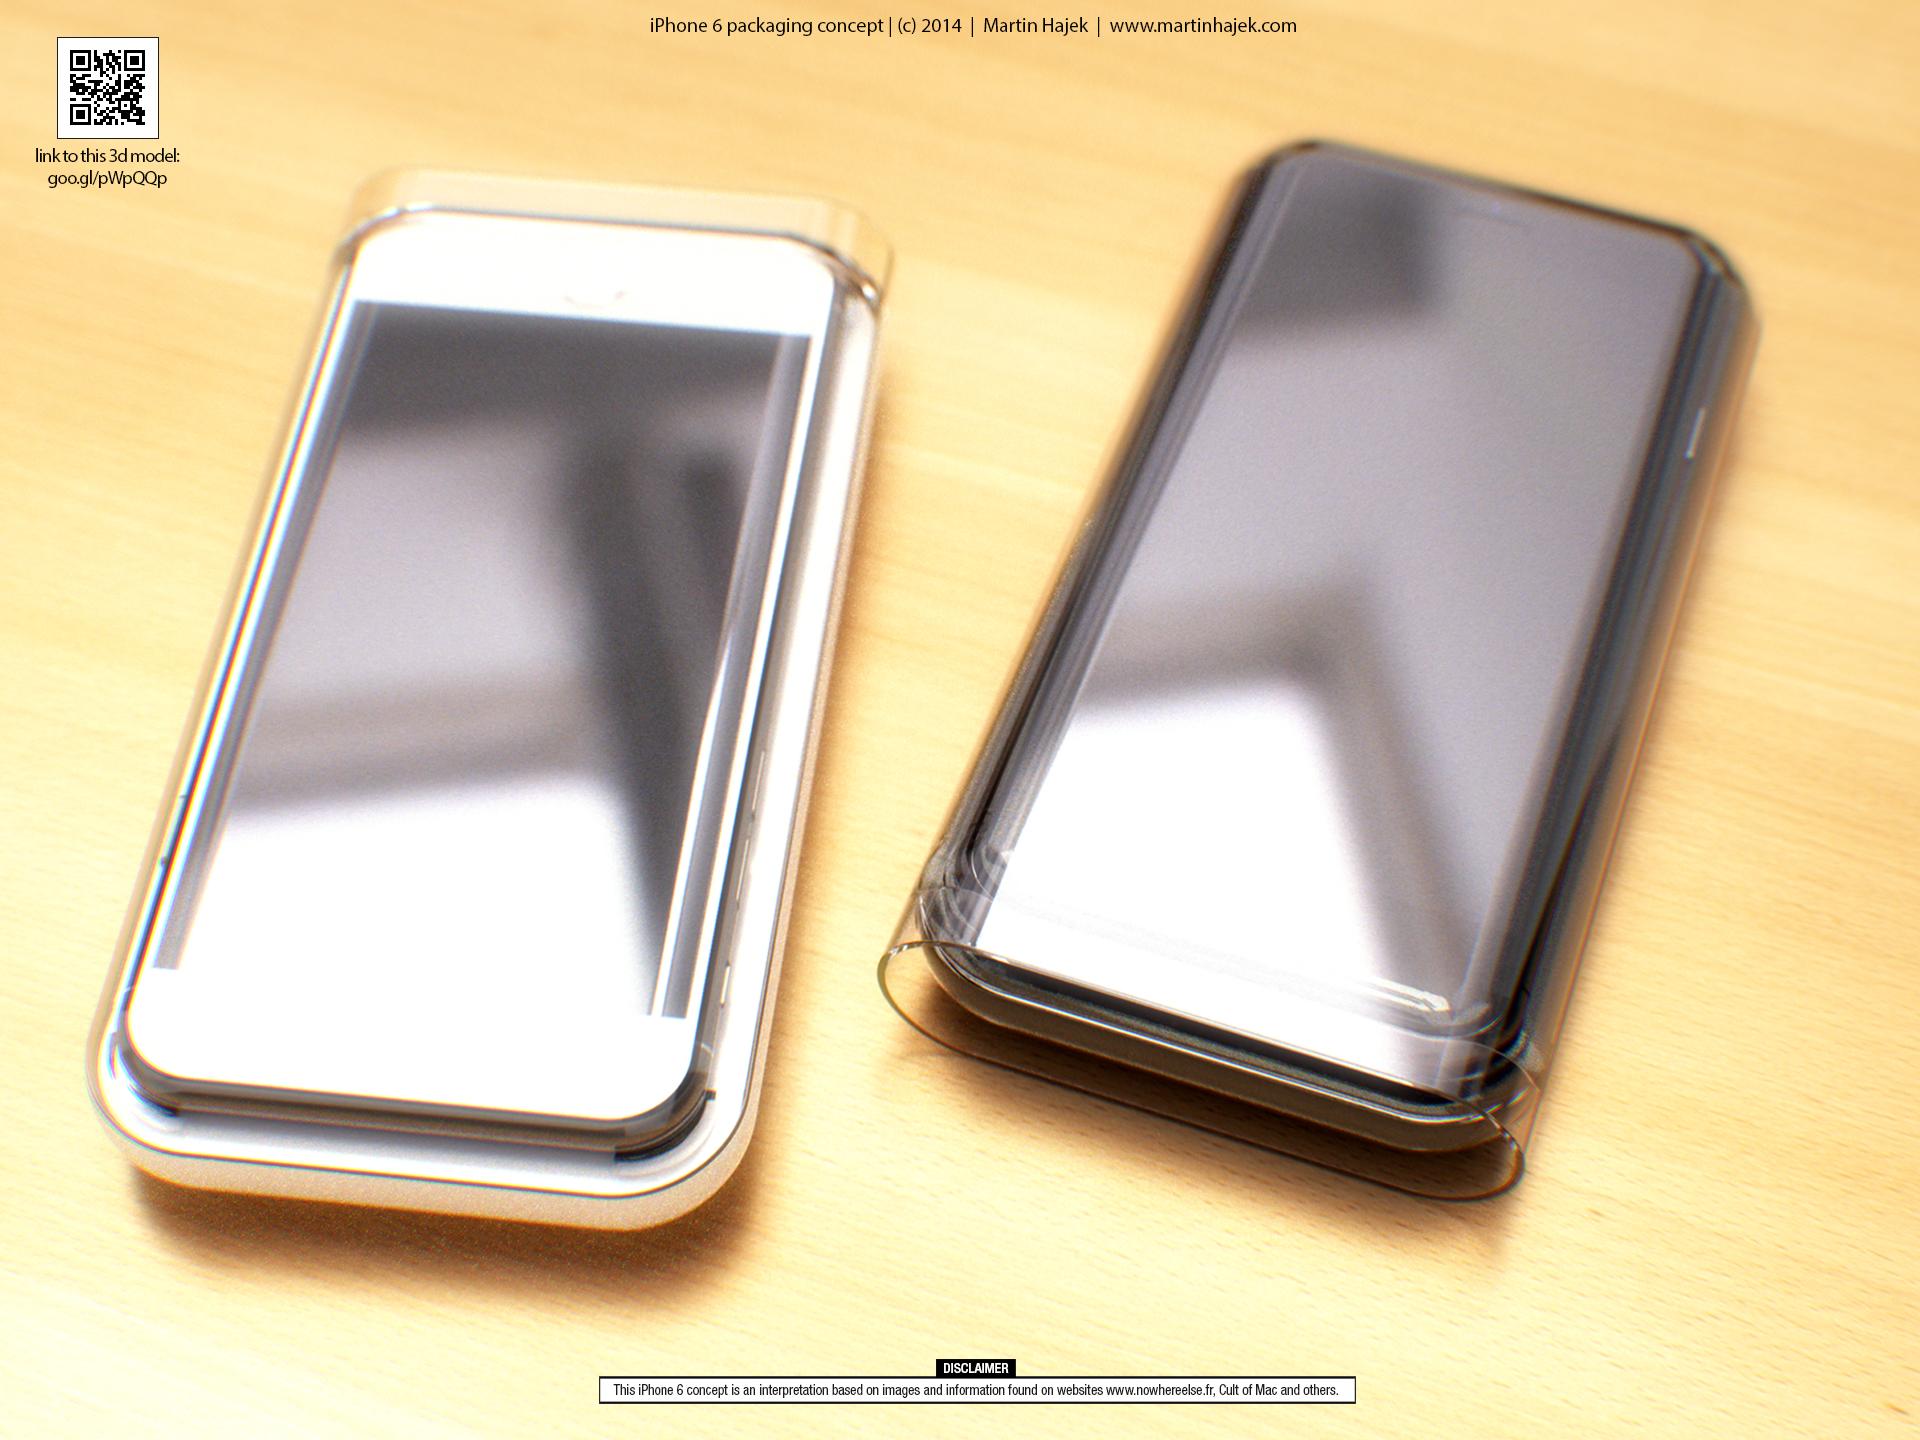 iPhone-6-in-box